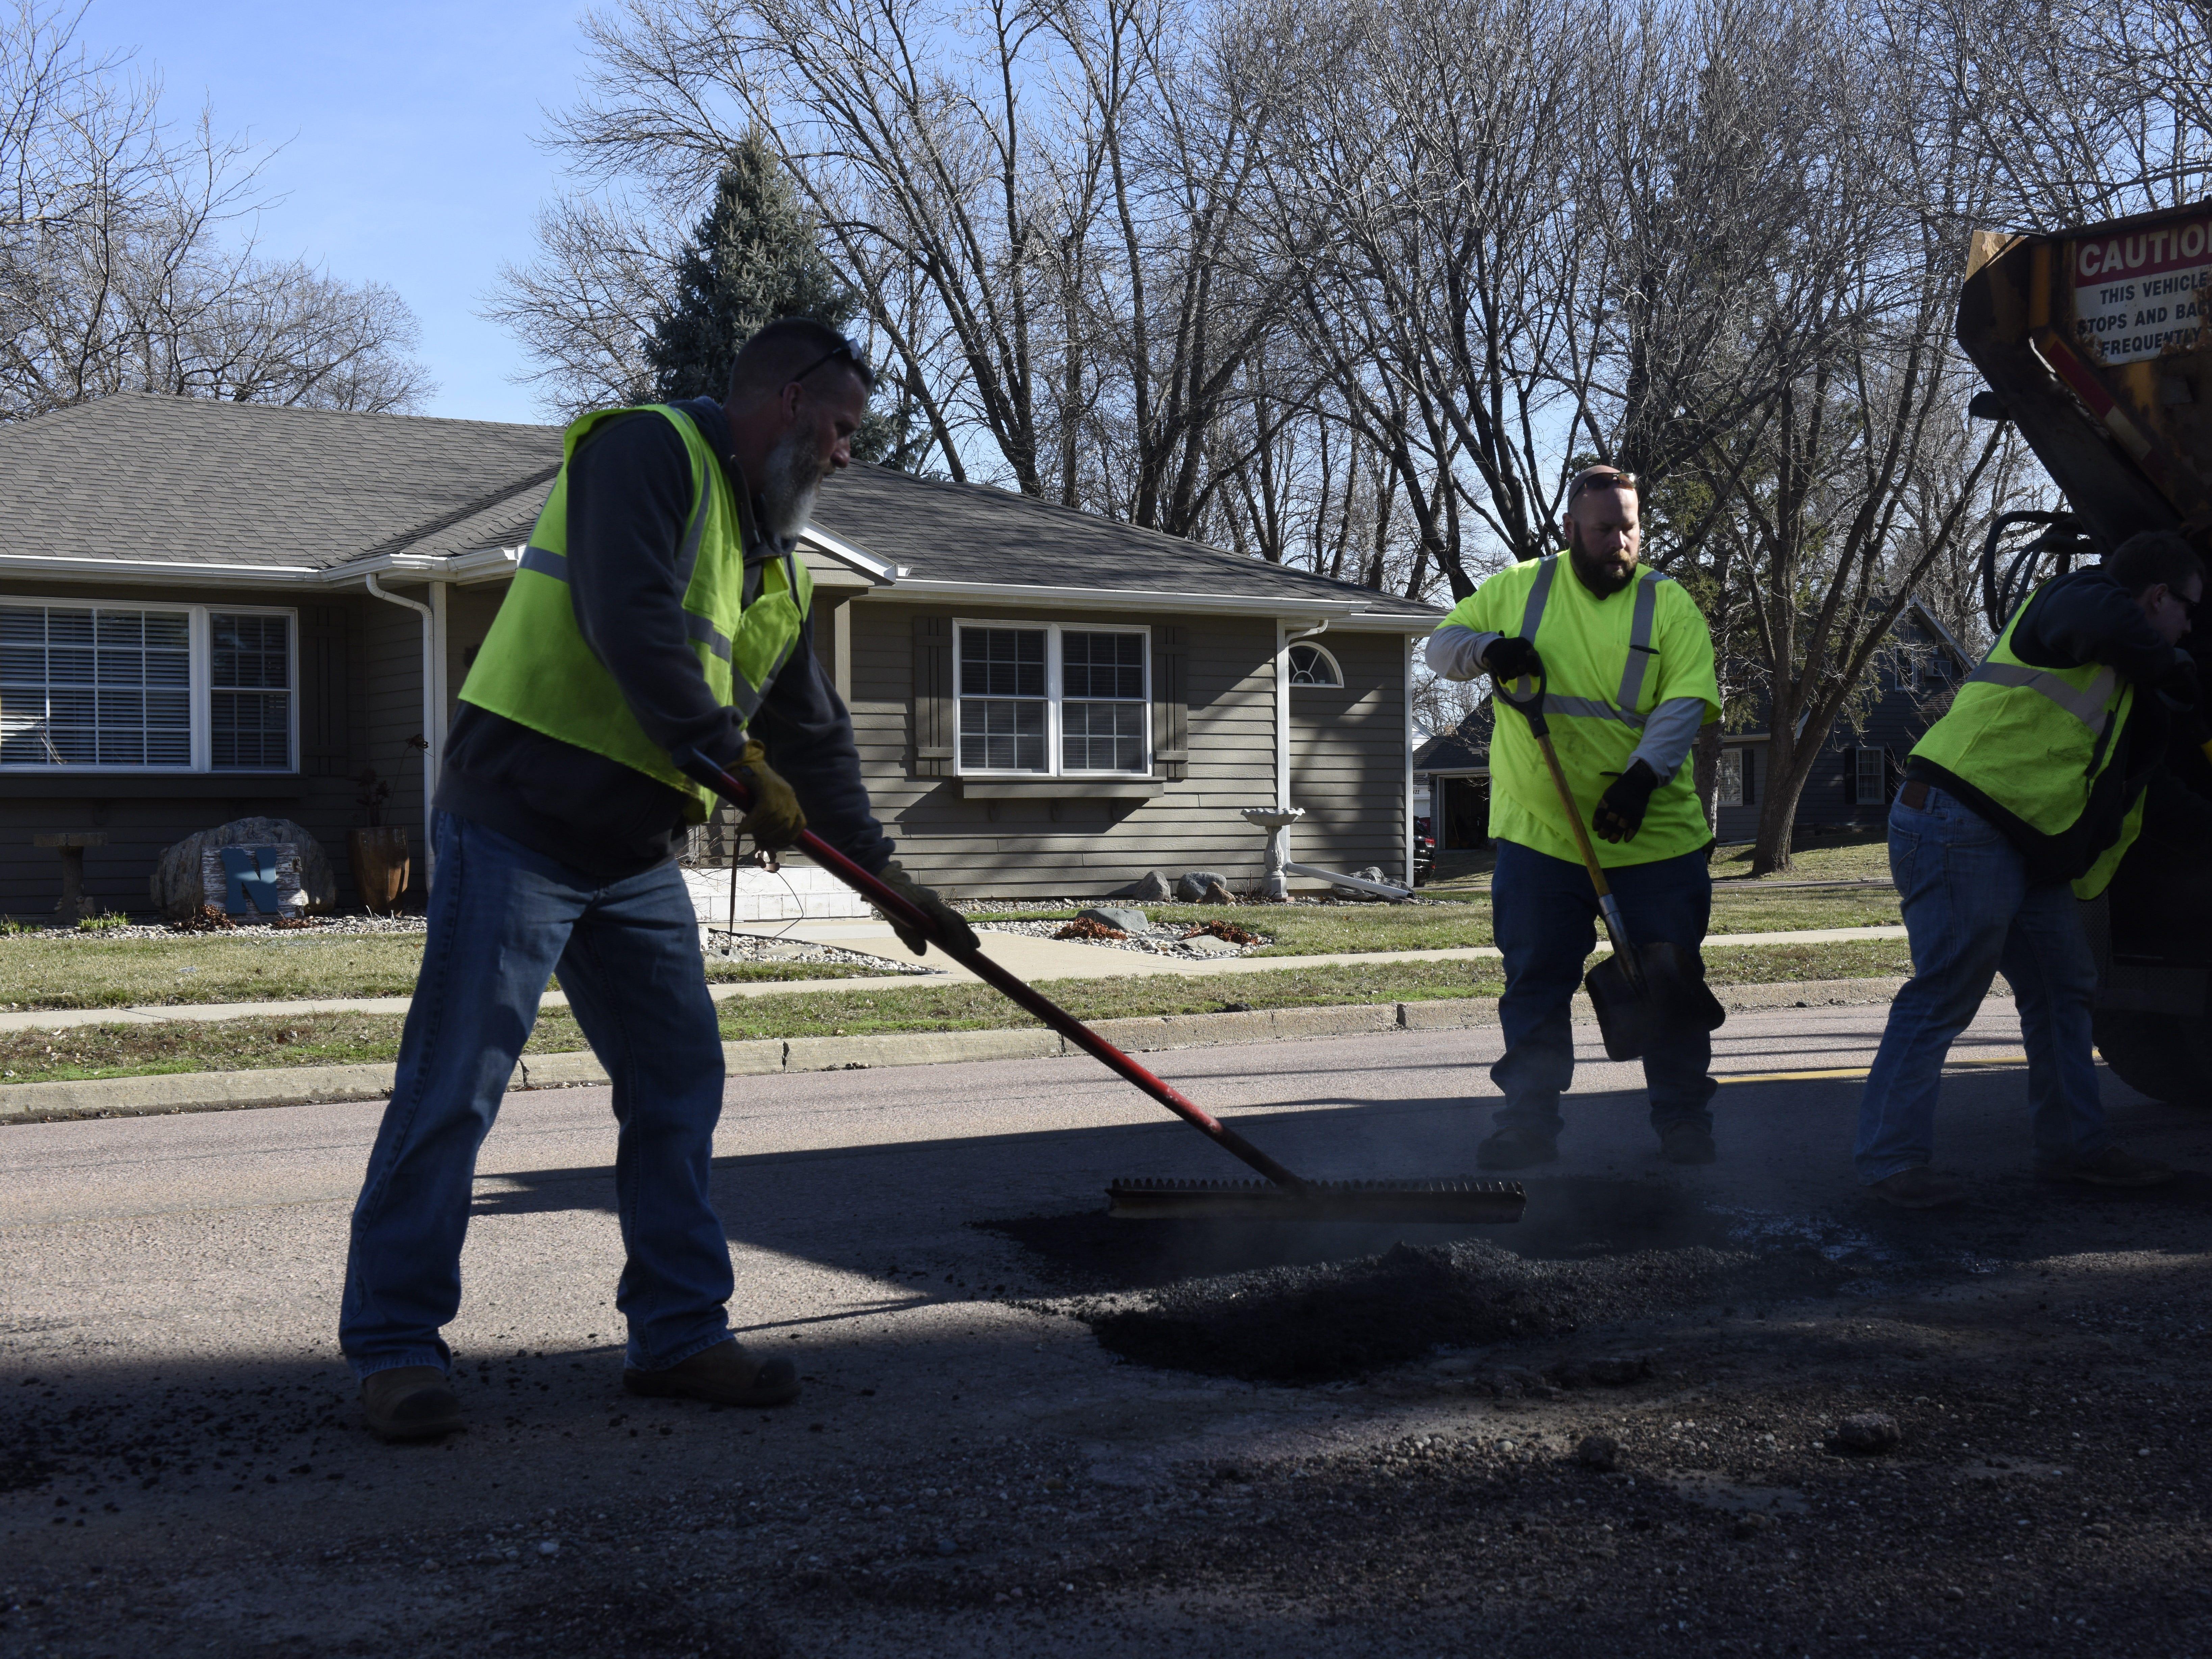 Chad Sundvold, Erik Harrington and Mike O'Kane repair a road on April 8.